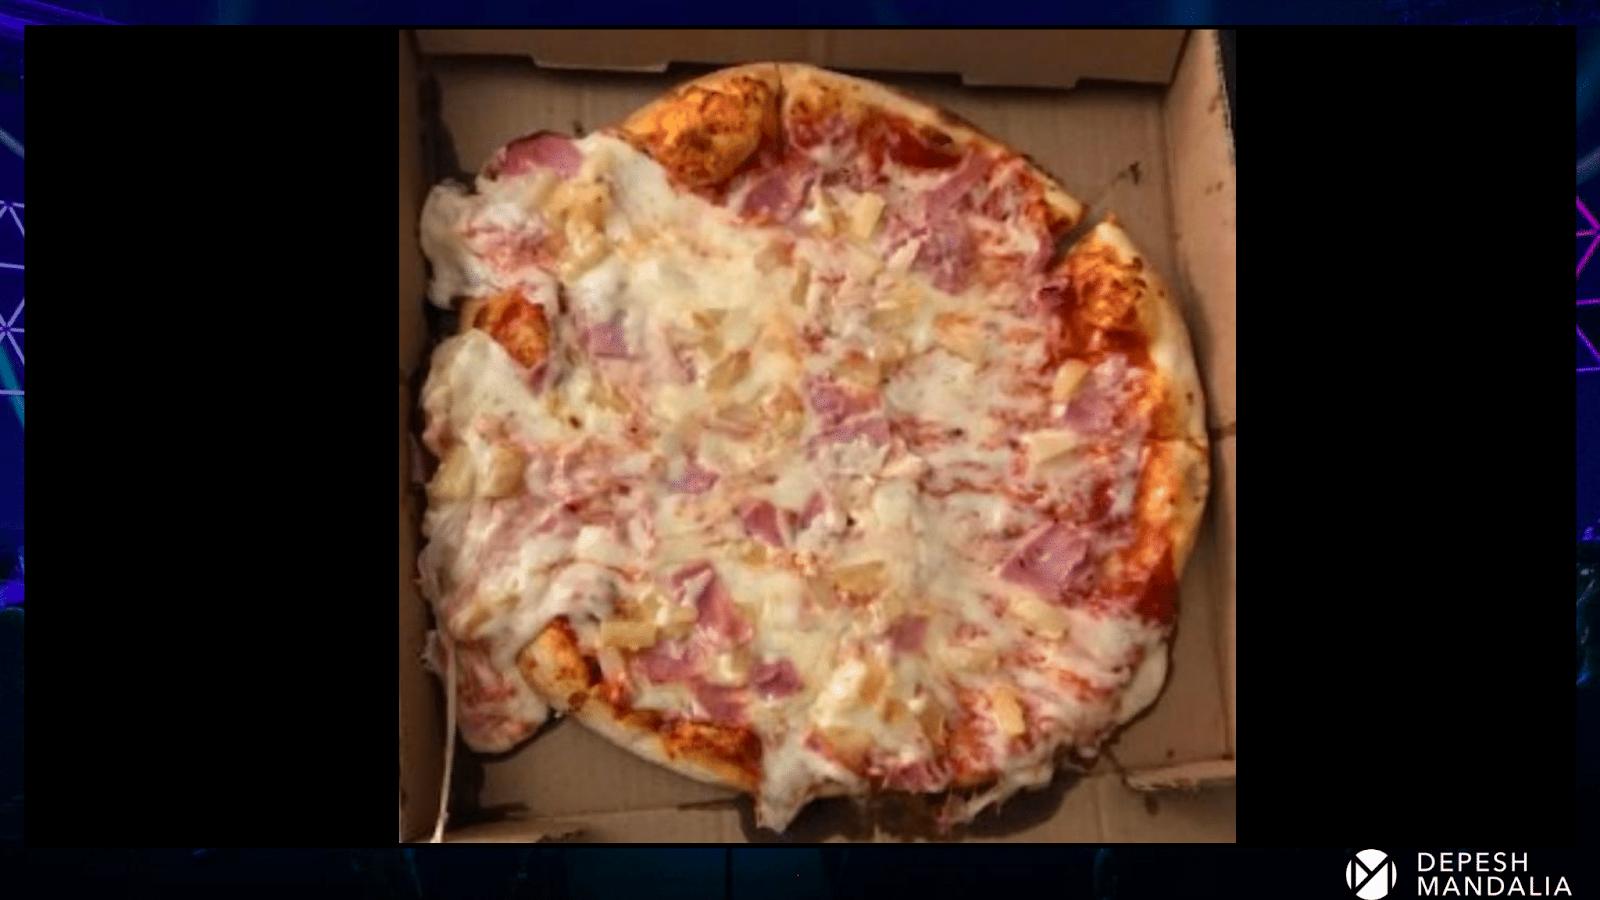 Вторая пицца от Депеша Мандалии